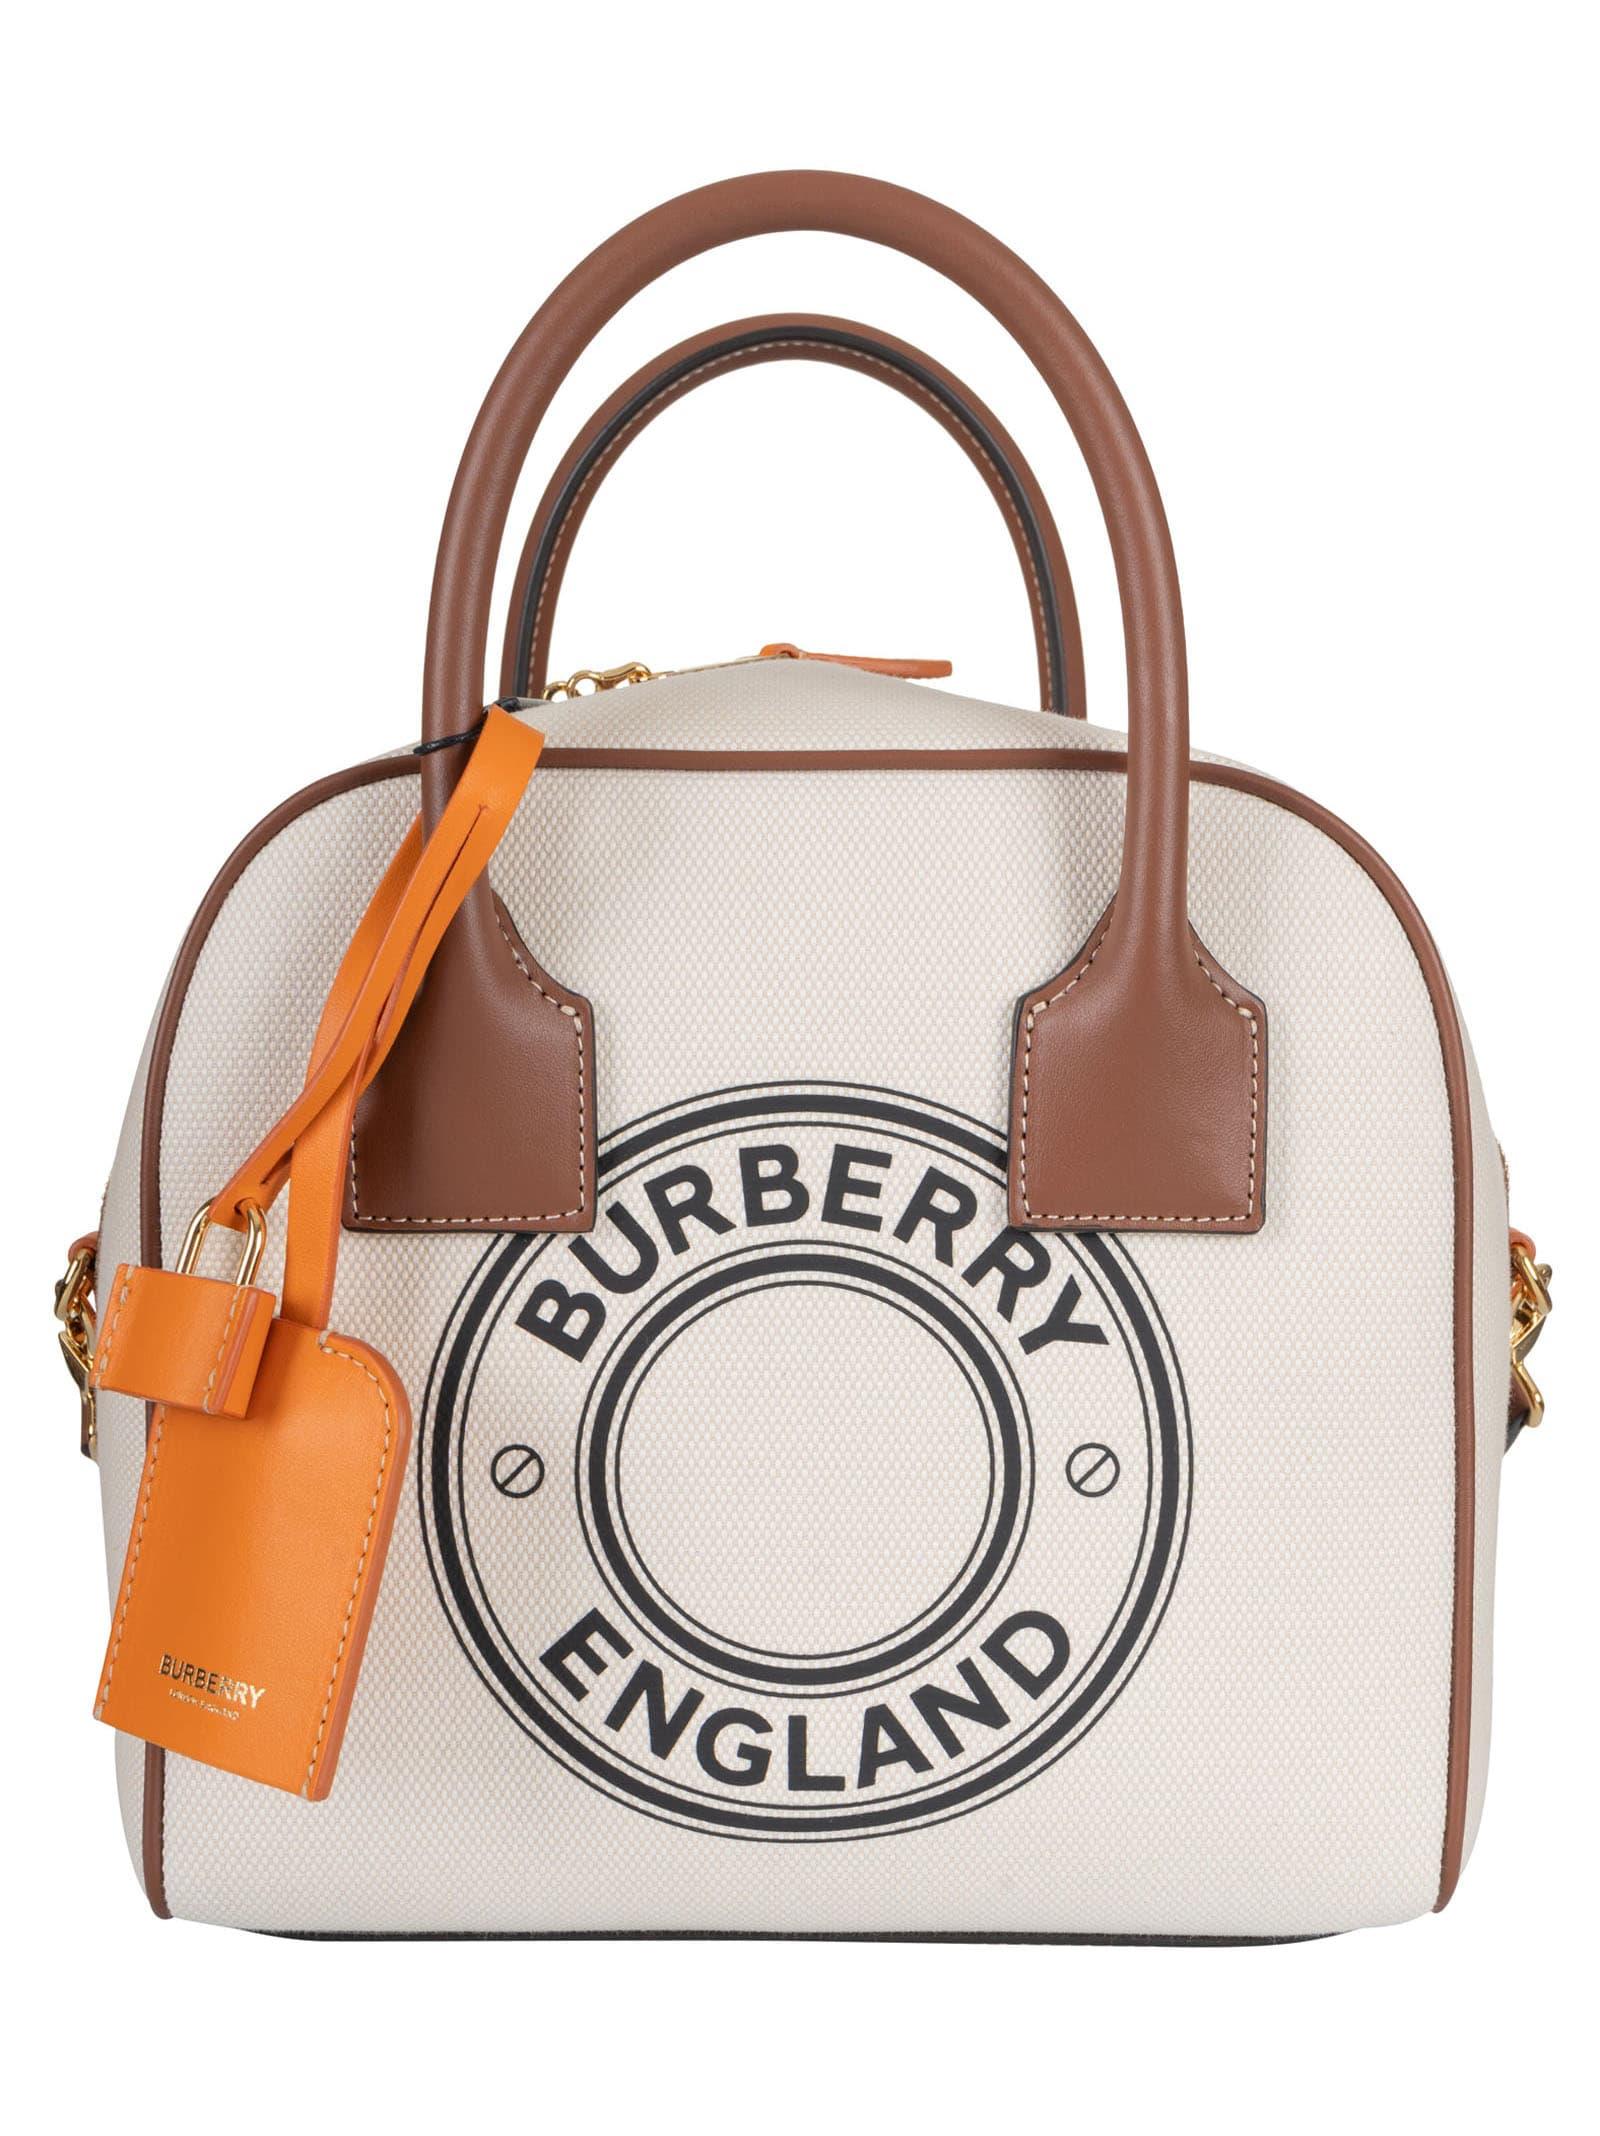 Burberry Cube Shoulder Bag